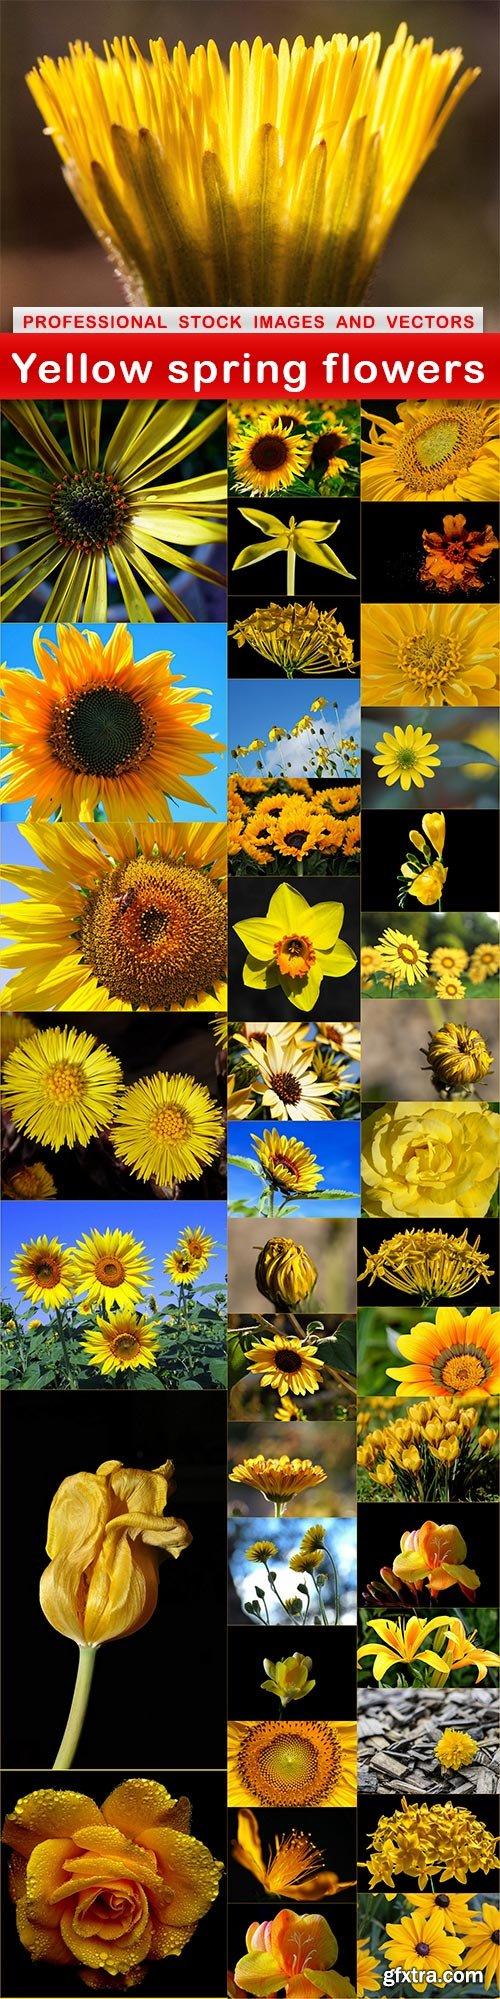 Yellow spring flowers - 40 UHQ JPEG